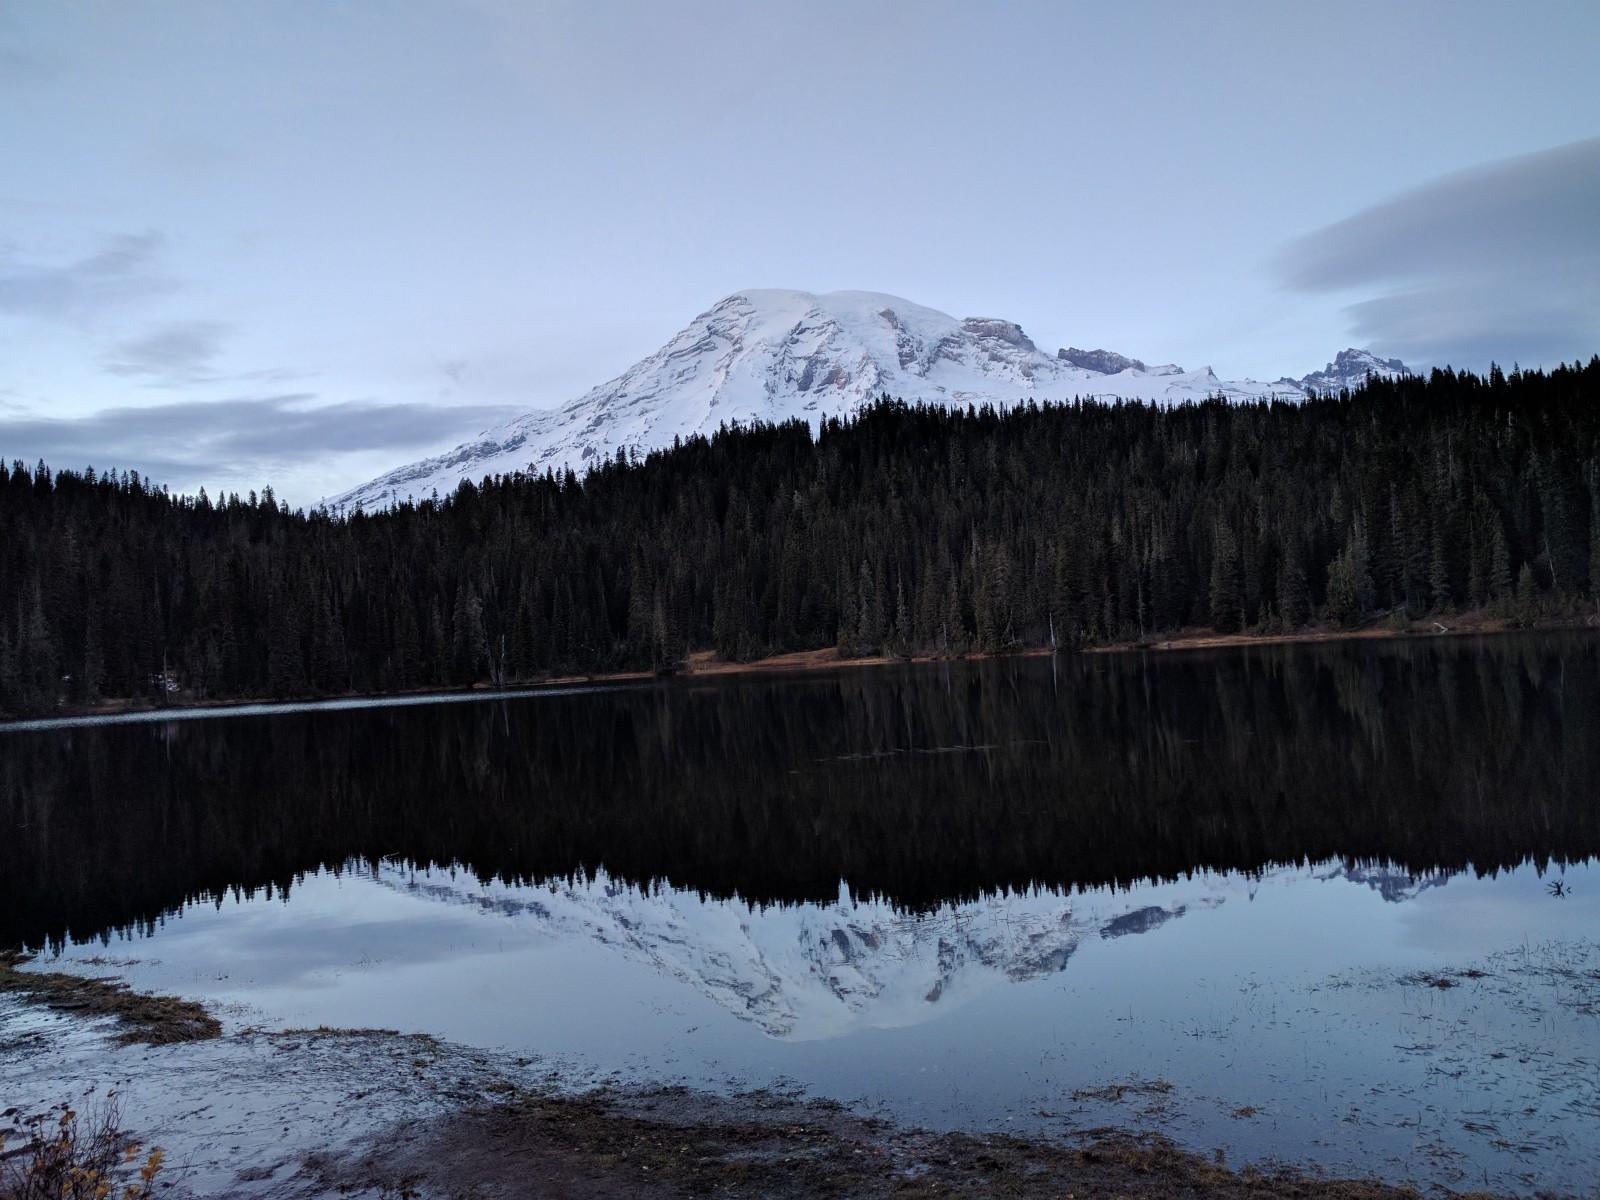 Mt. Rainier from Reflection Lakes, Mt. Rainier National Park, Washington.